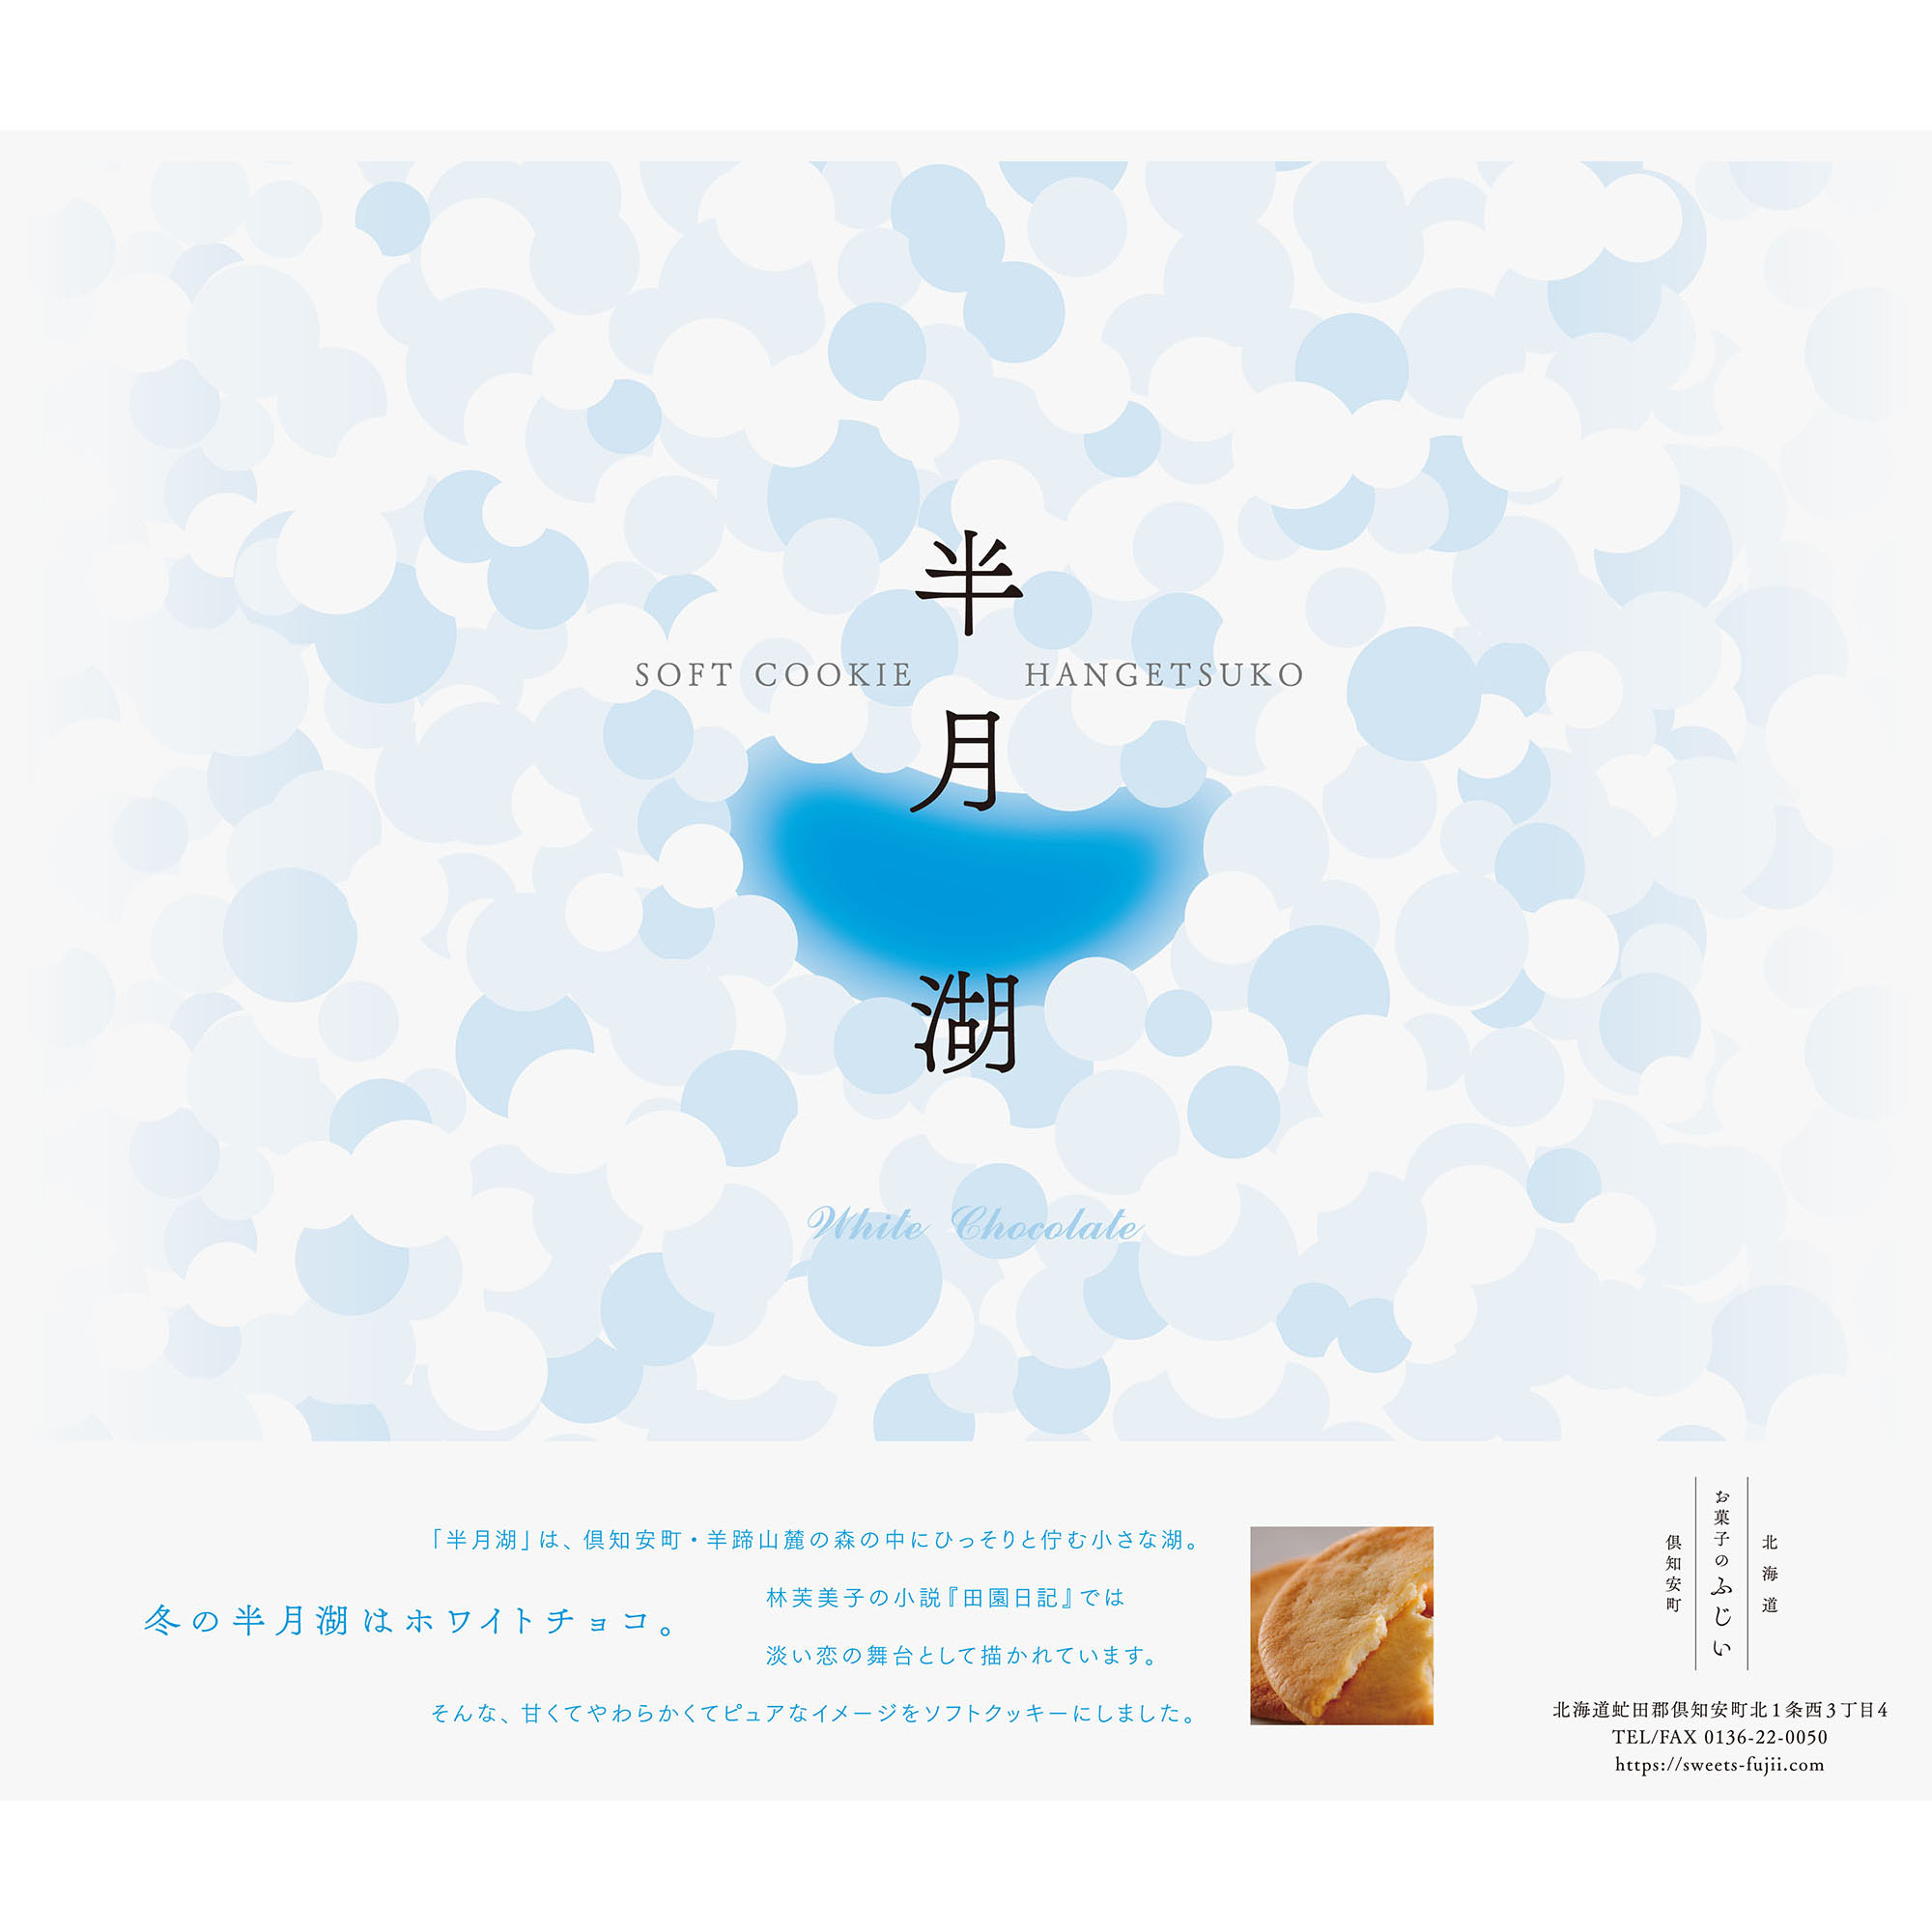 Hangetsuko, Soft Cookie